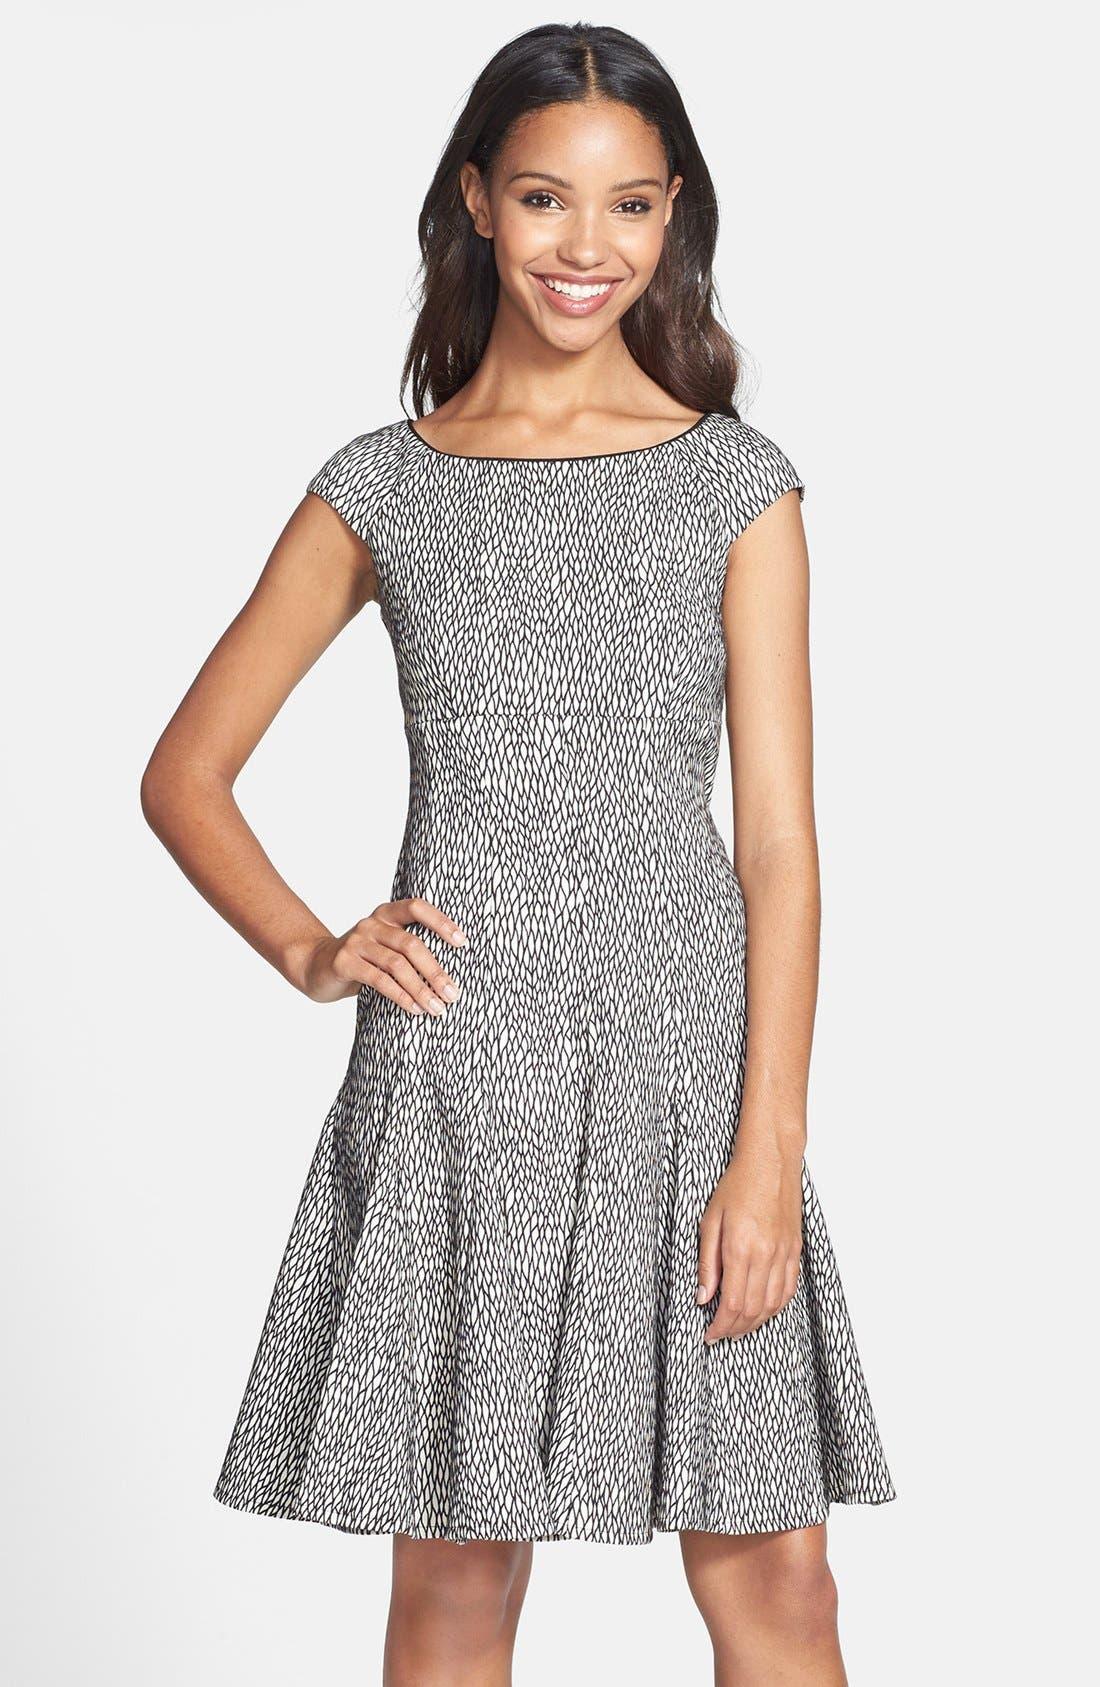 Main Image - Gabby Skye Jacquard Fit & Flare Dress